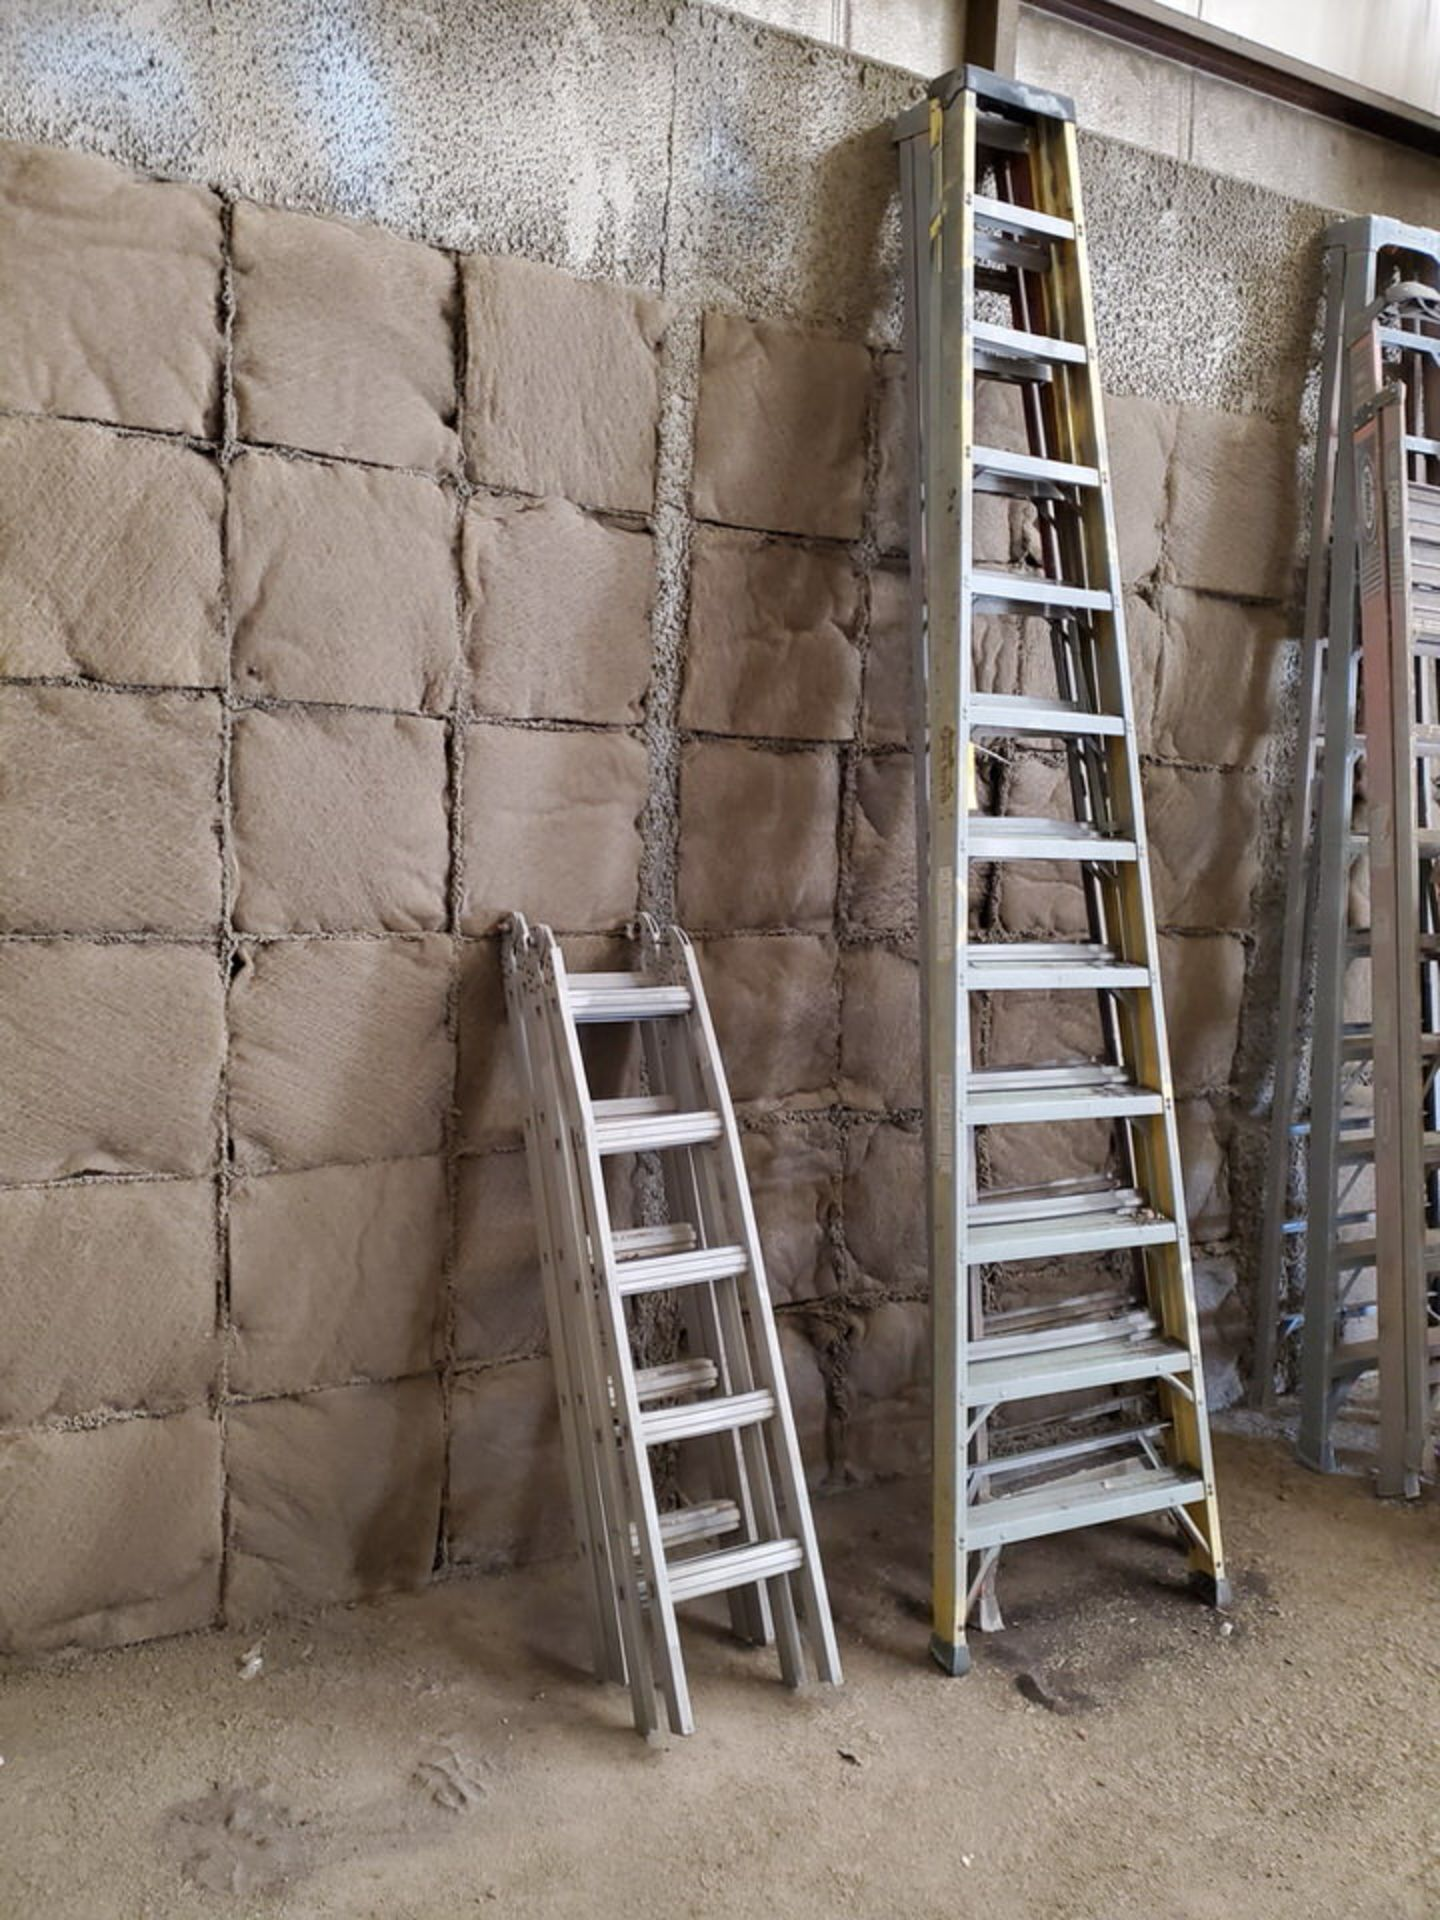 (4) Assorted Fiberglass Platform Ladders Sizes: (2) 4', (2) 14' - Image 3 of 4